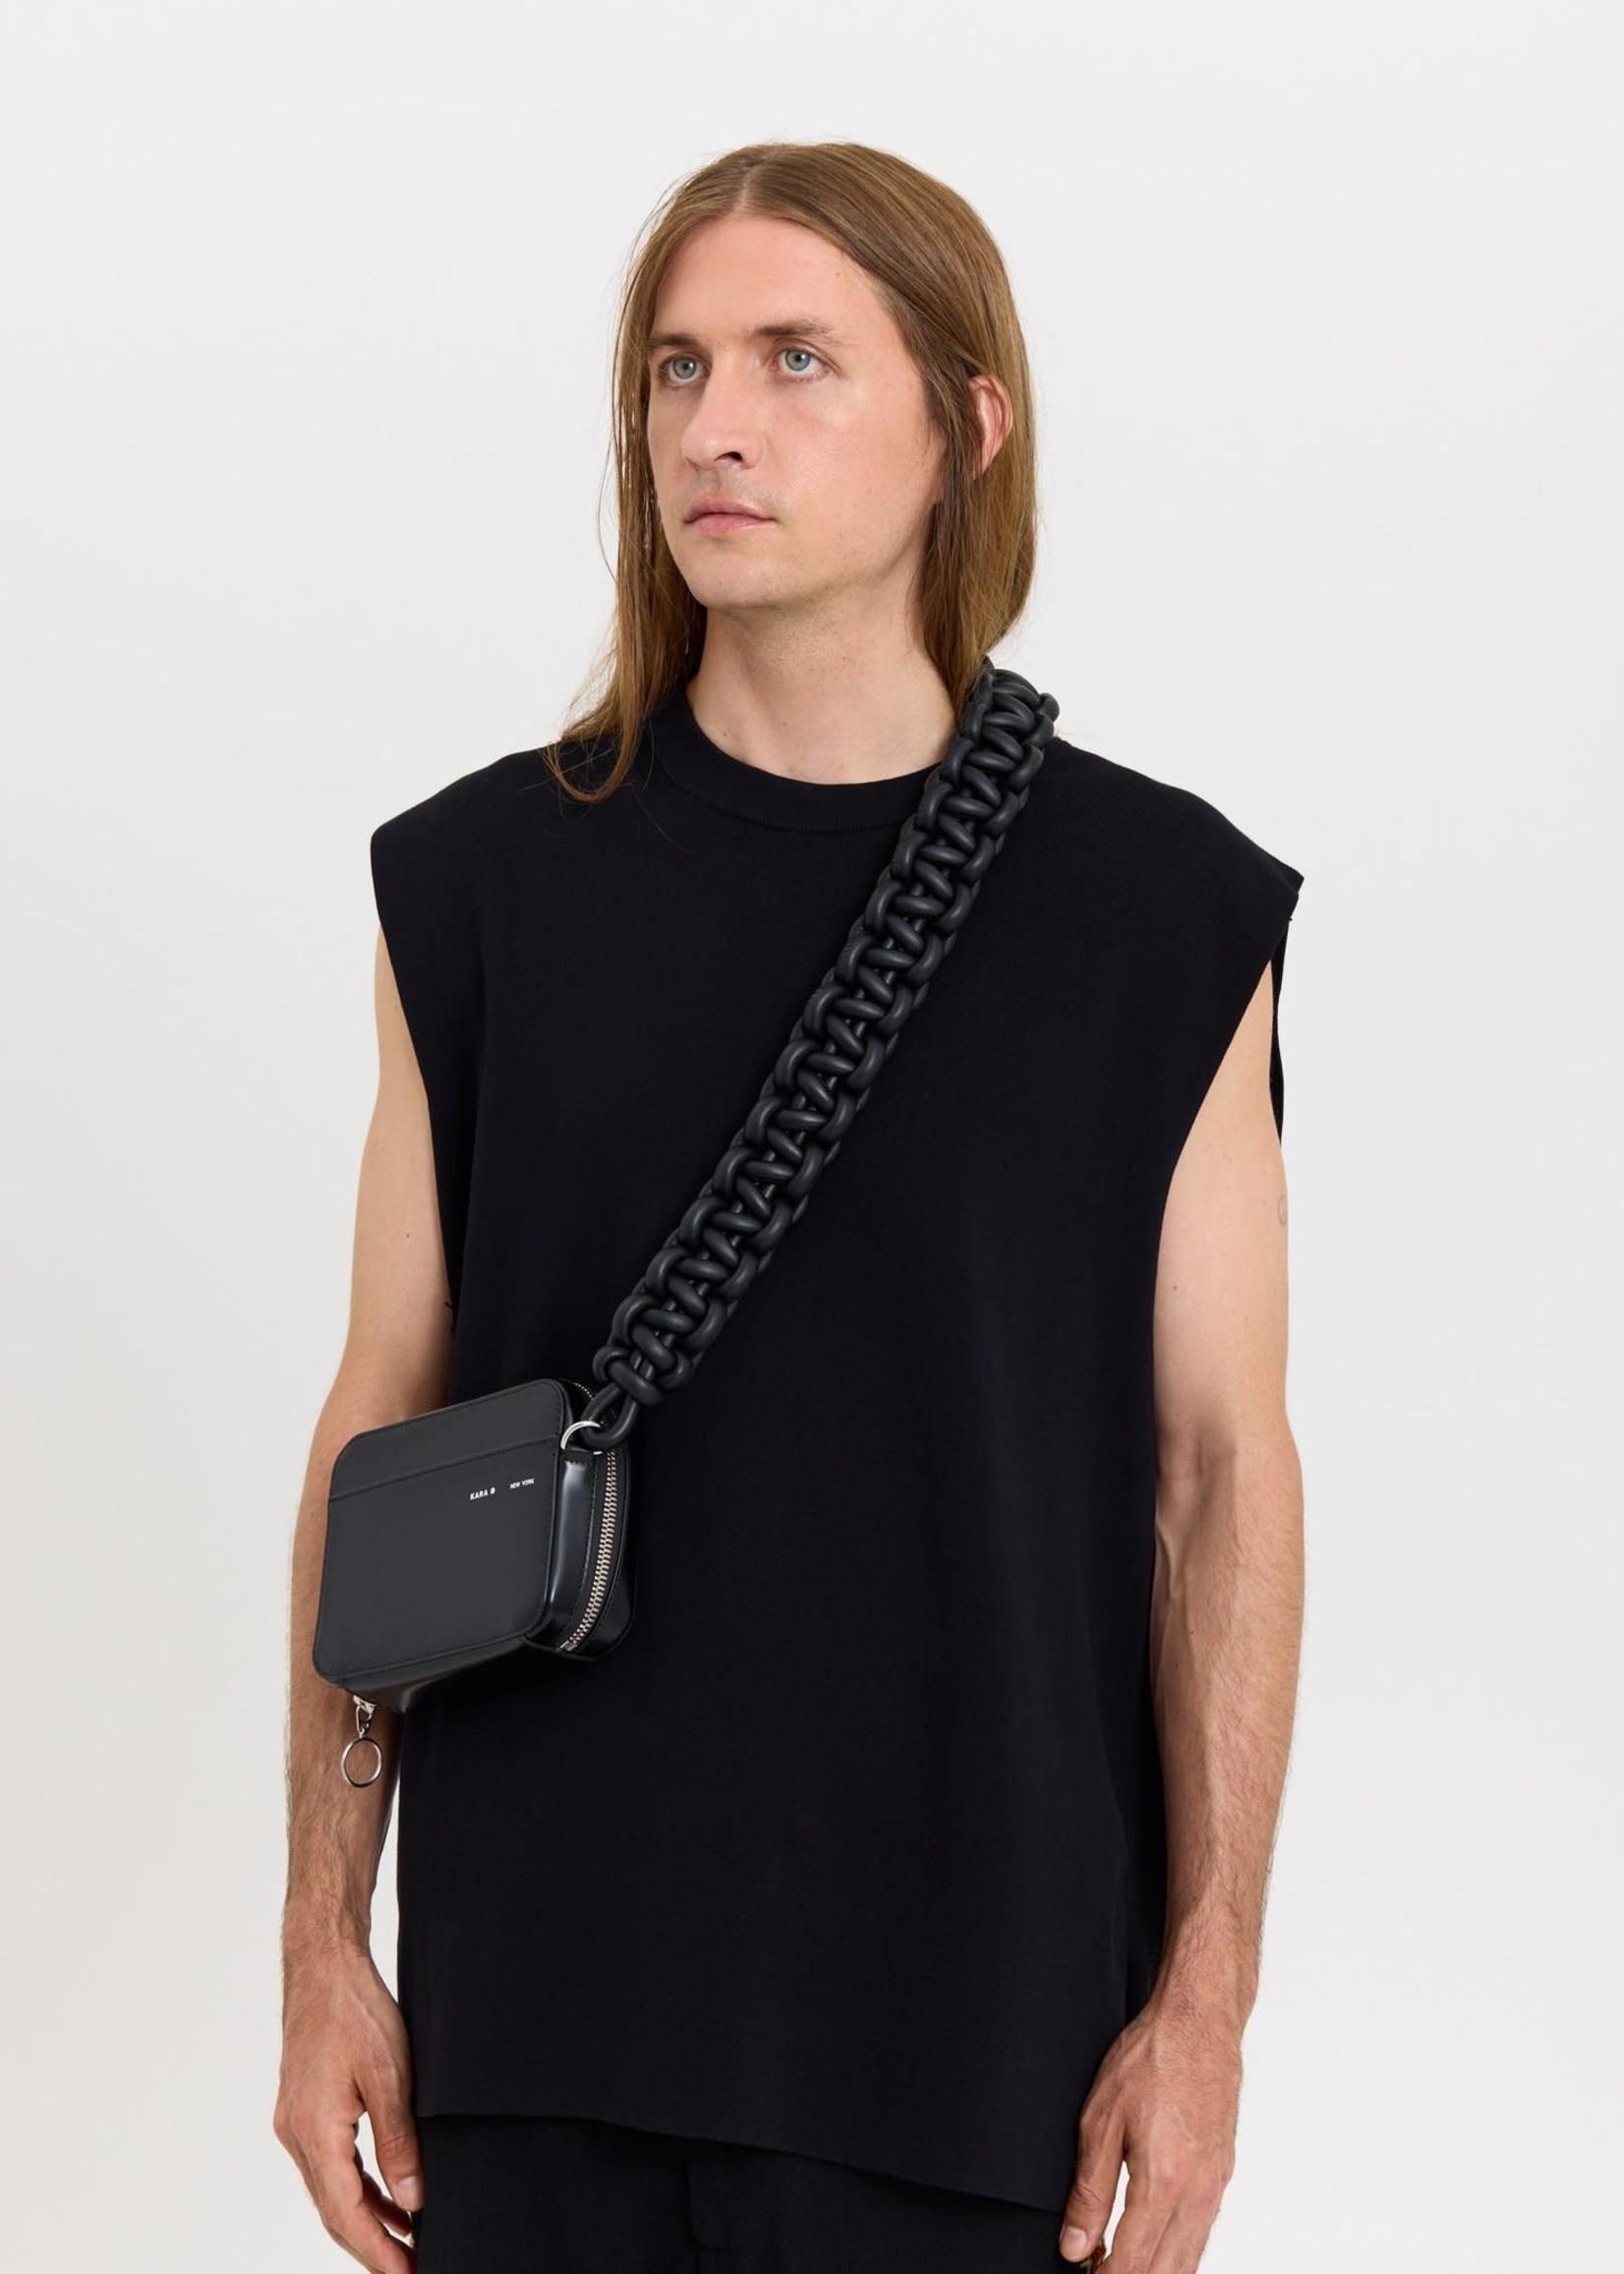 KARA Cobra Camera Bag in Black